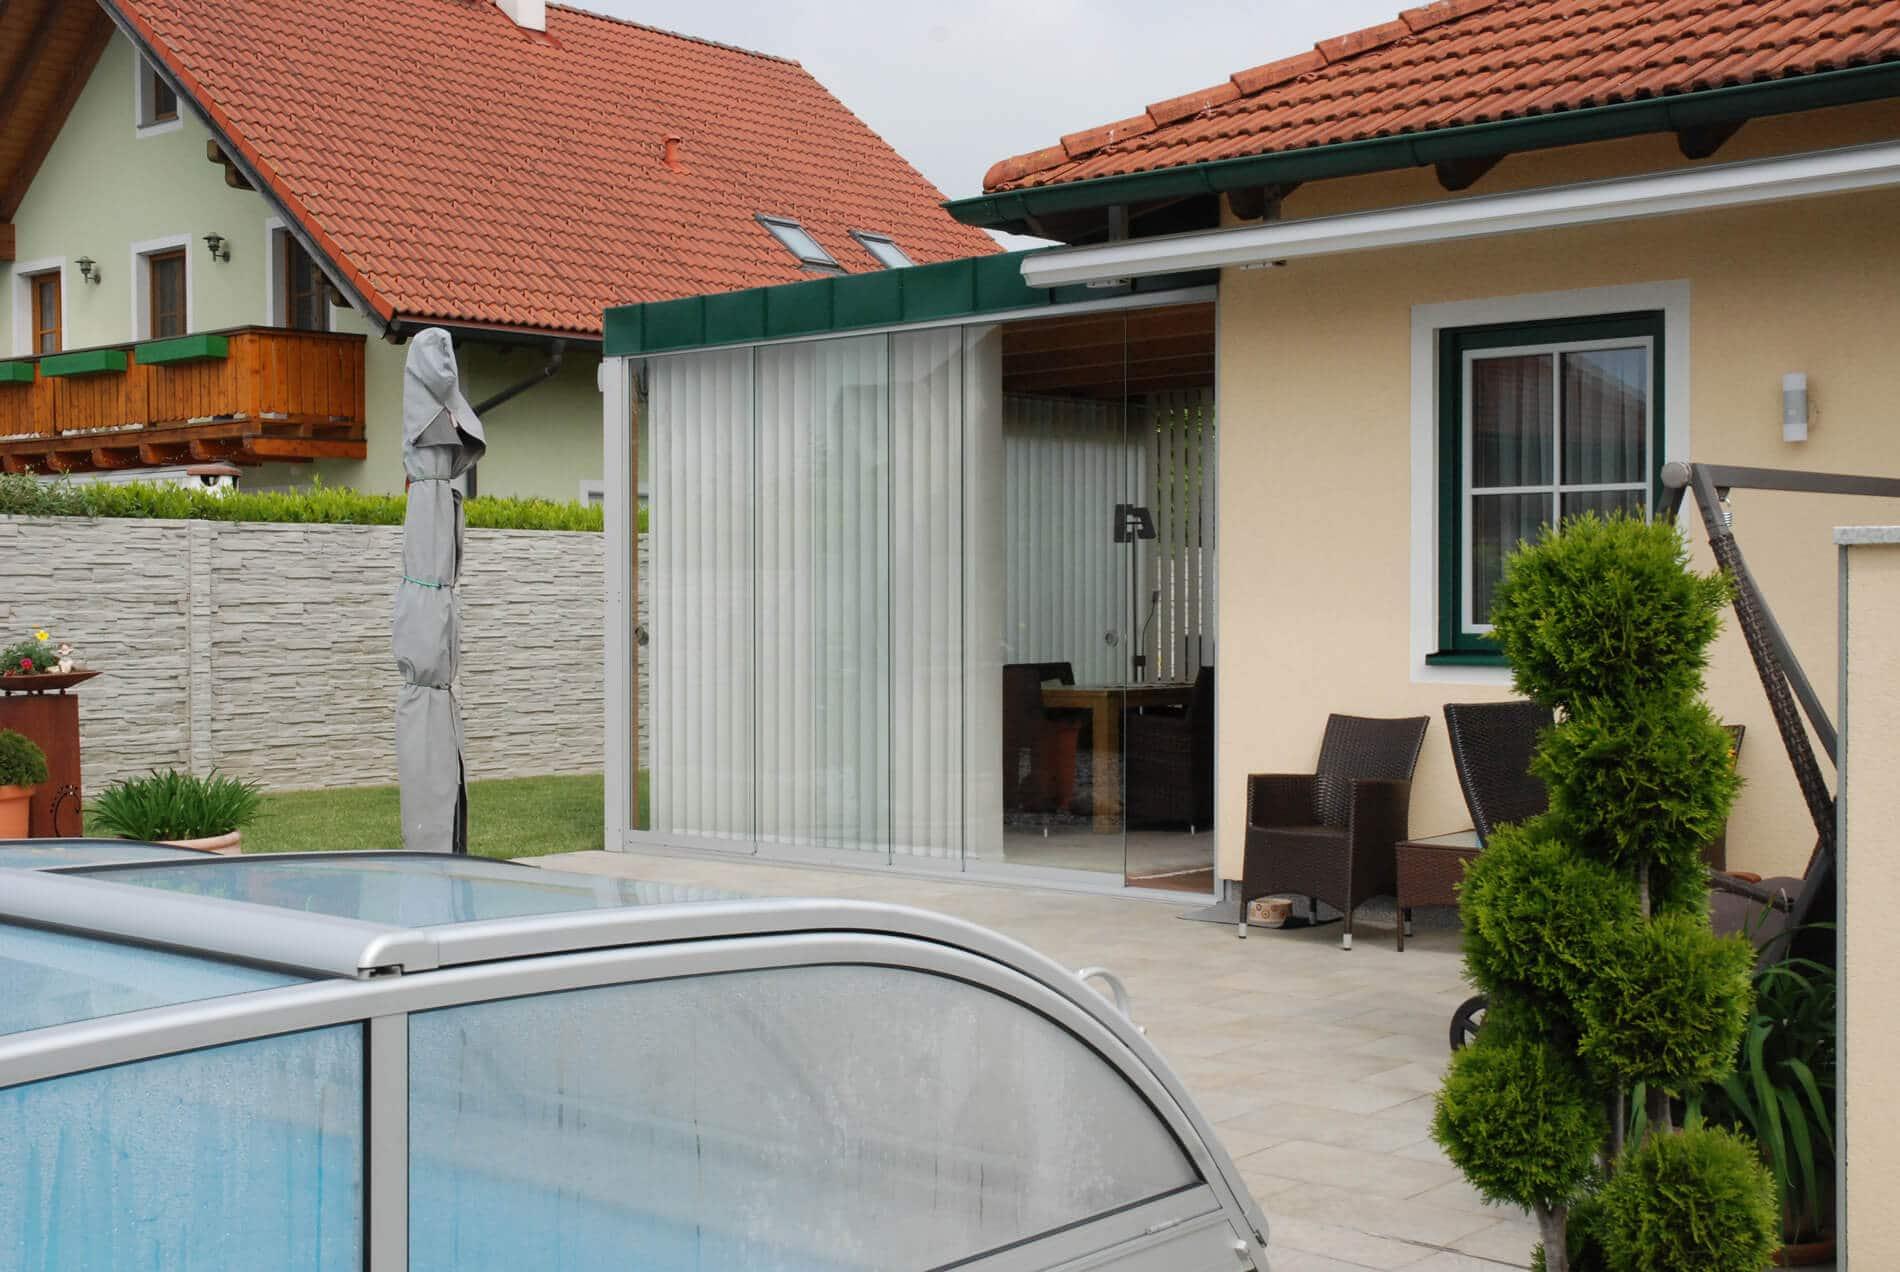 Holz-Aluminium Anbauwintergarten - Schiebesysteme Sunflex